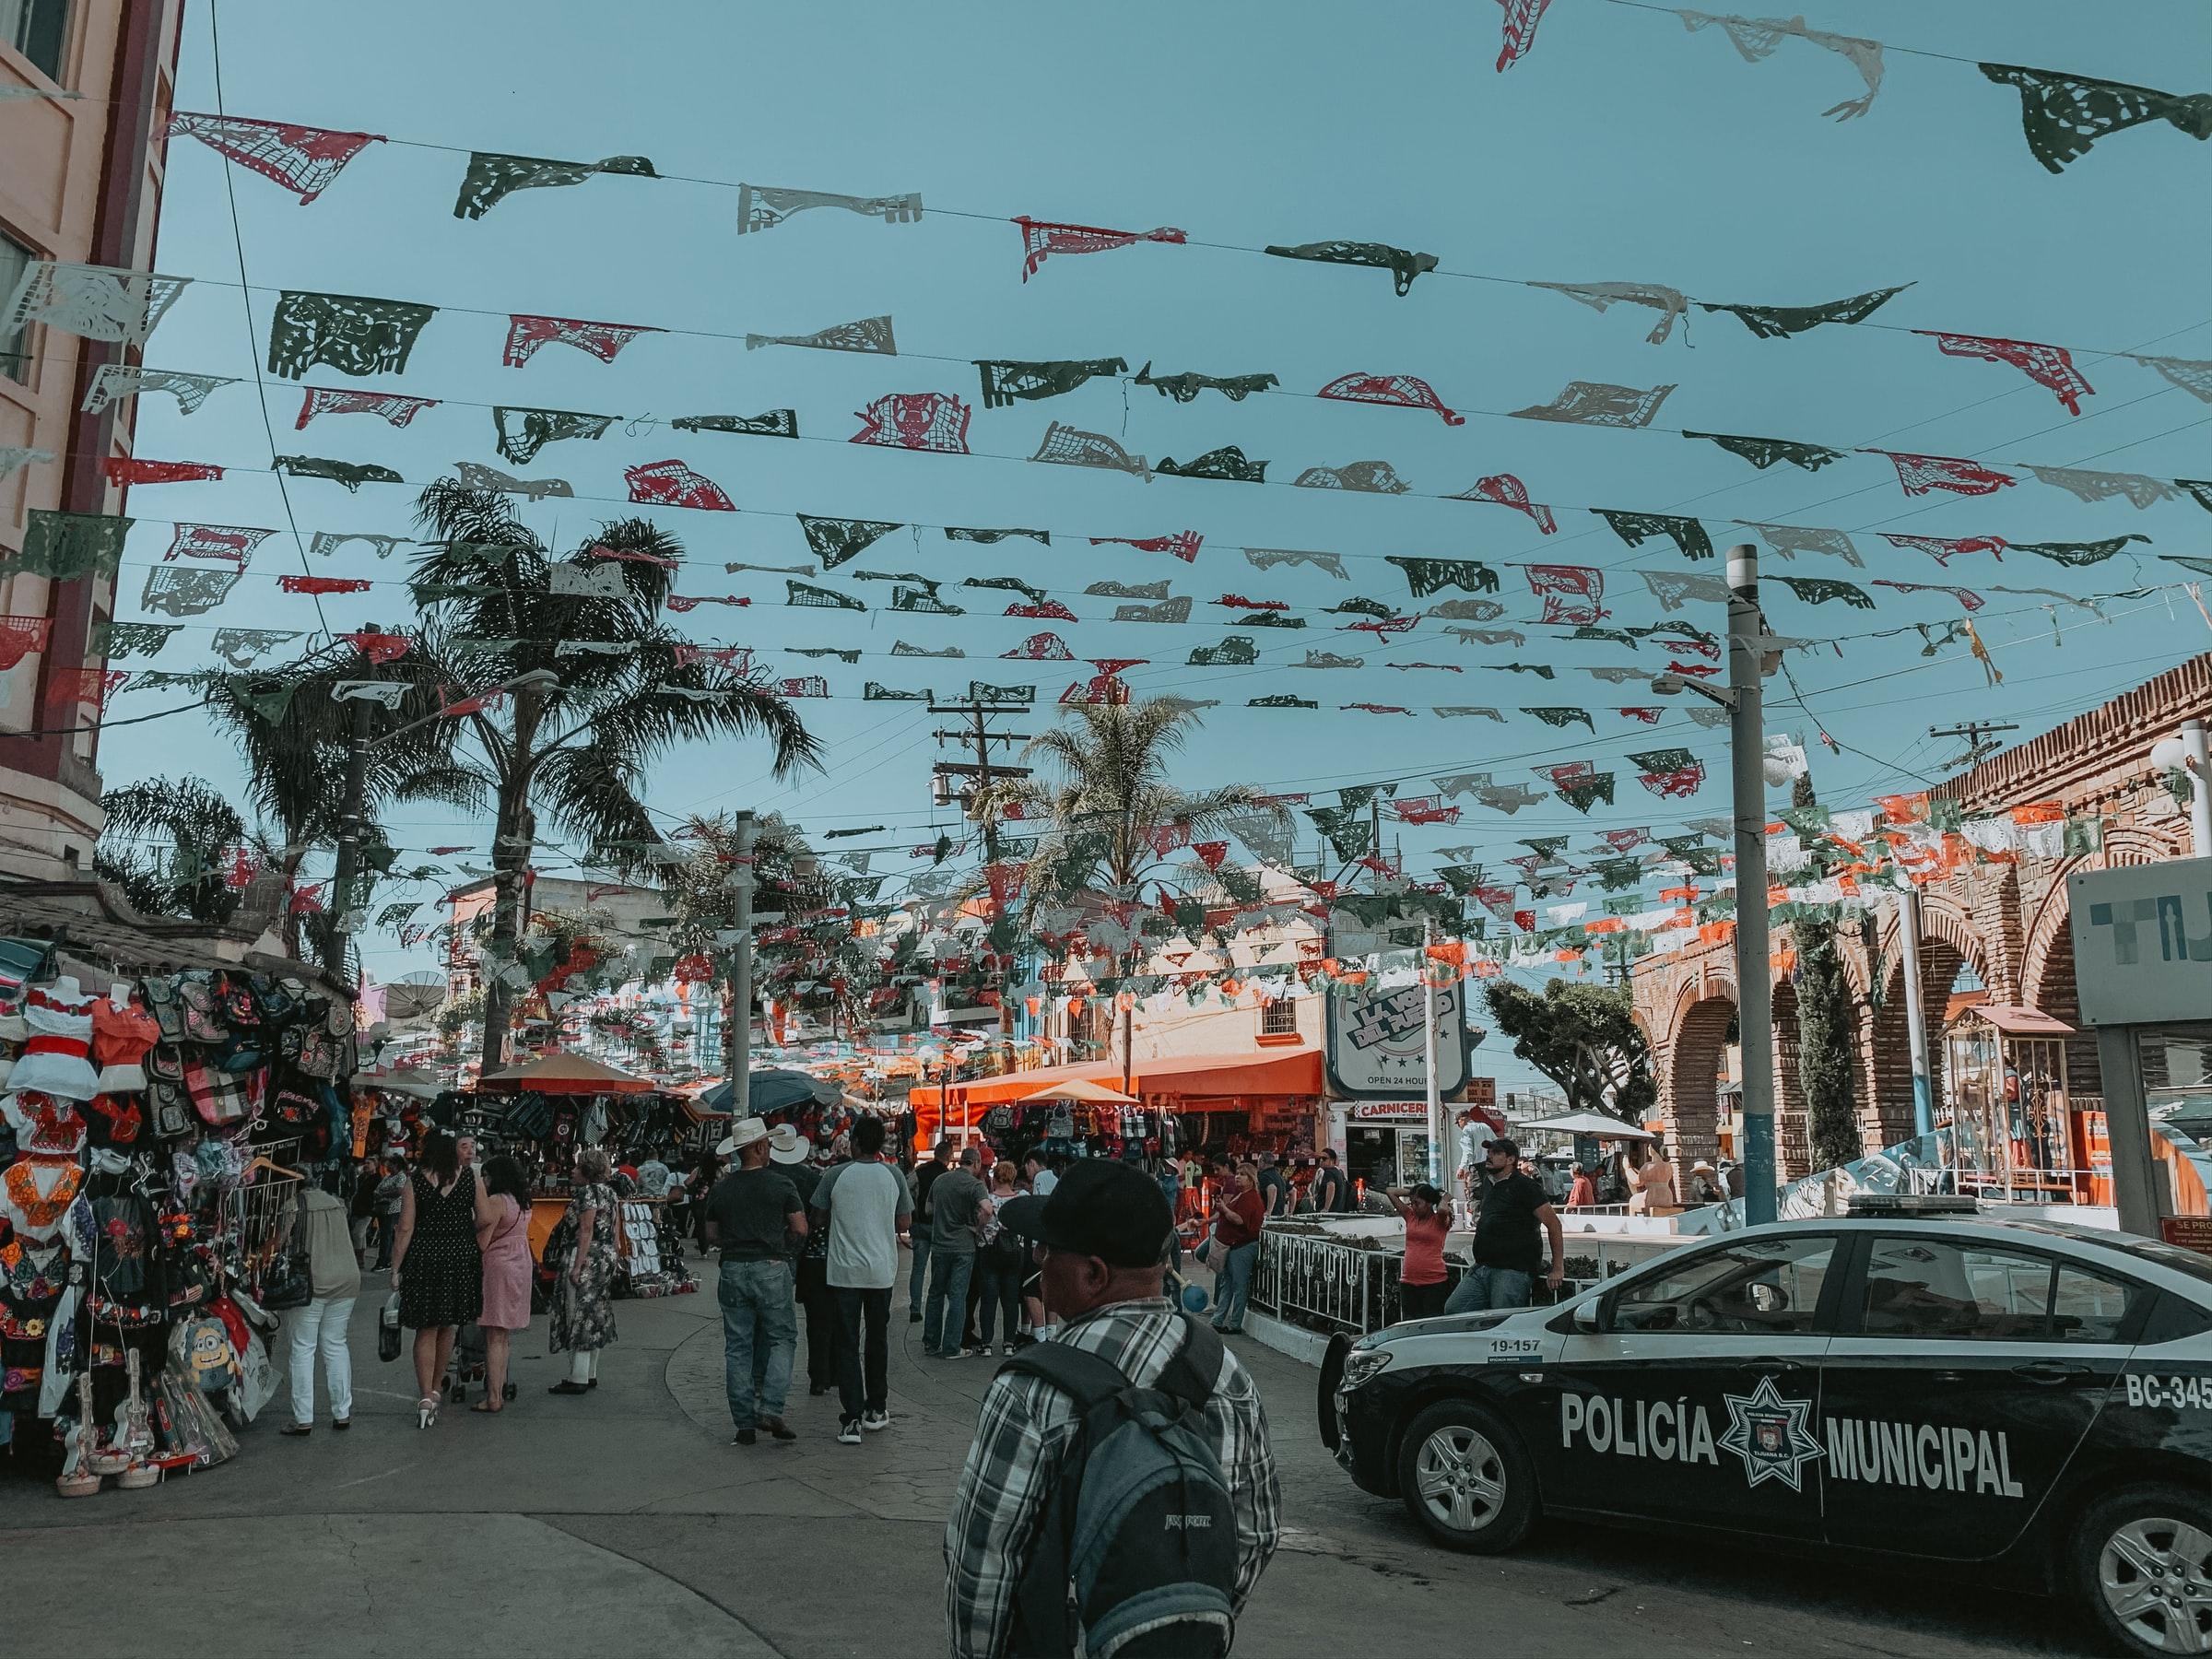 corrupte politie in mexico auto huren